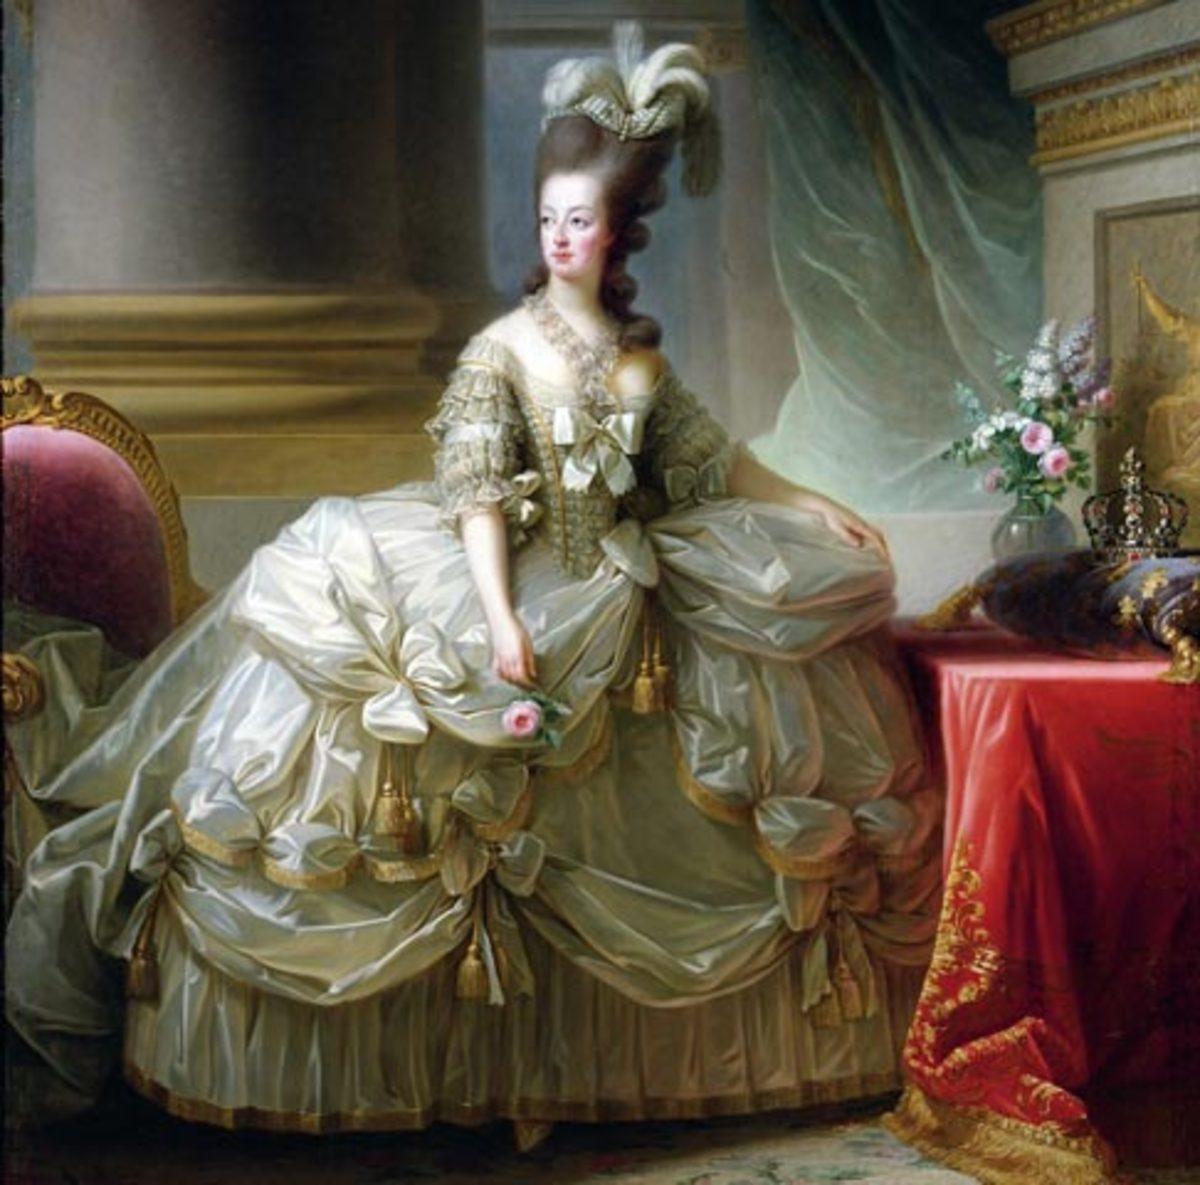 Queen of France, Marie Antoinette